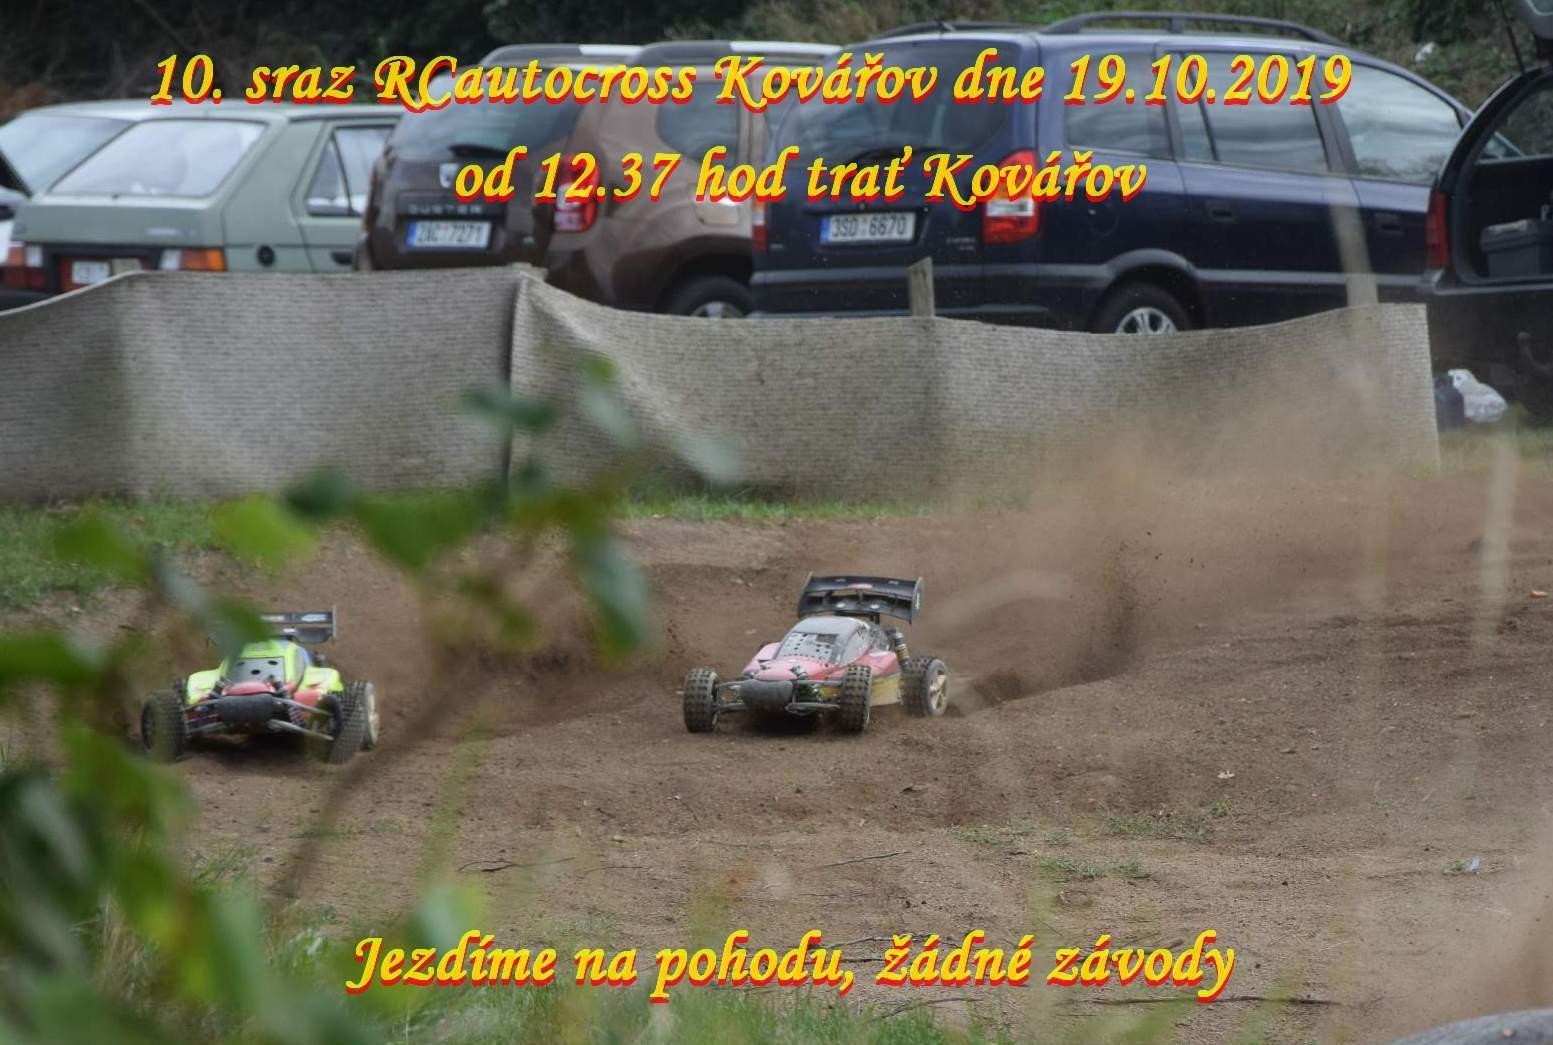 https://img24.rajce.idnes.cz/d2402/13/13870/13870315_ebc8da28dec63b155baae591a881c905/images/10.sraz.jpg?ver=0